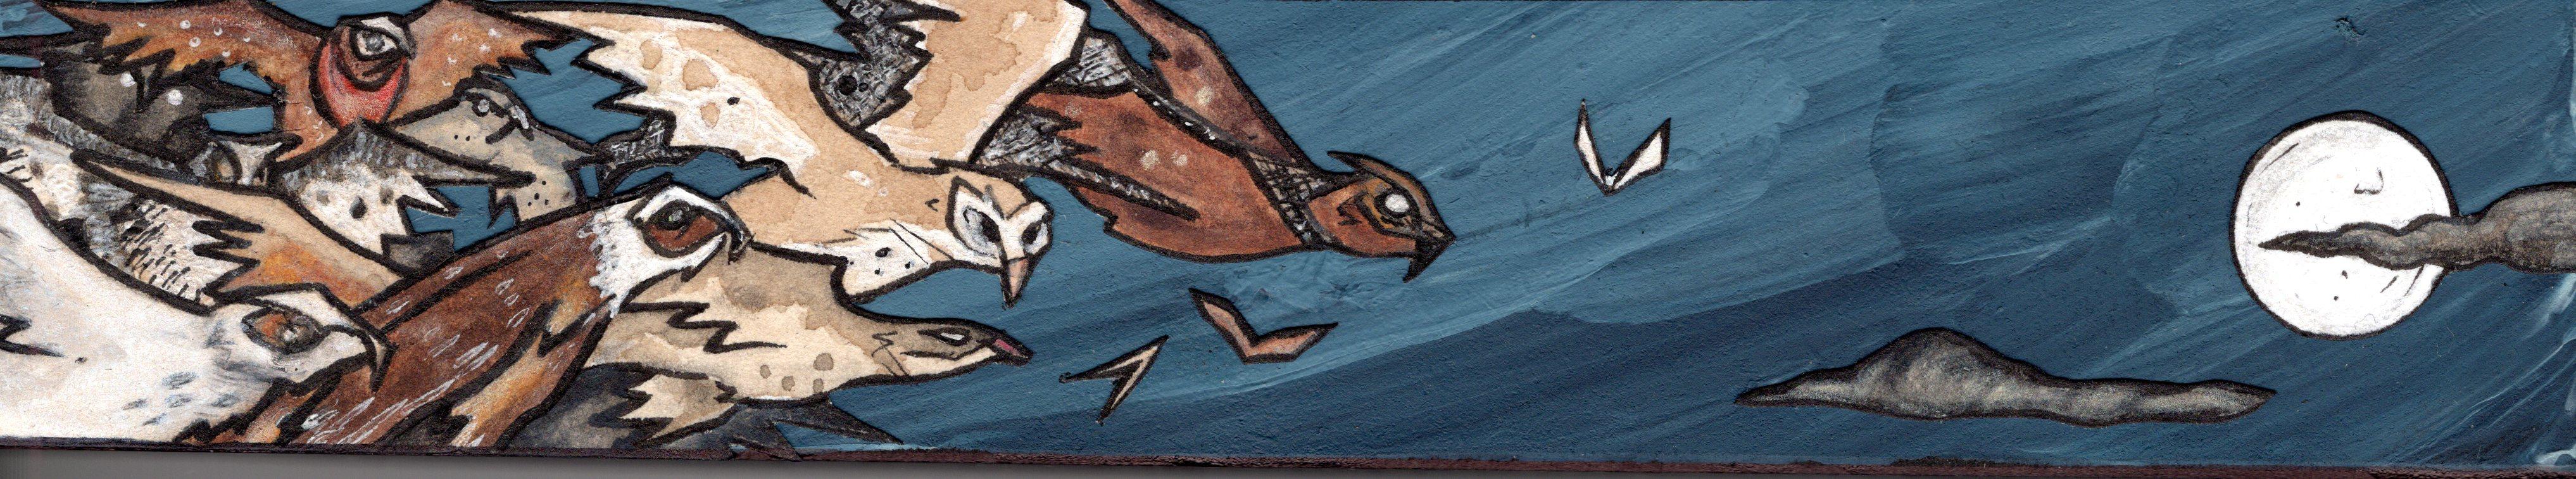 The Owls of Minerva fly at Midnight.